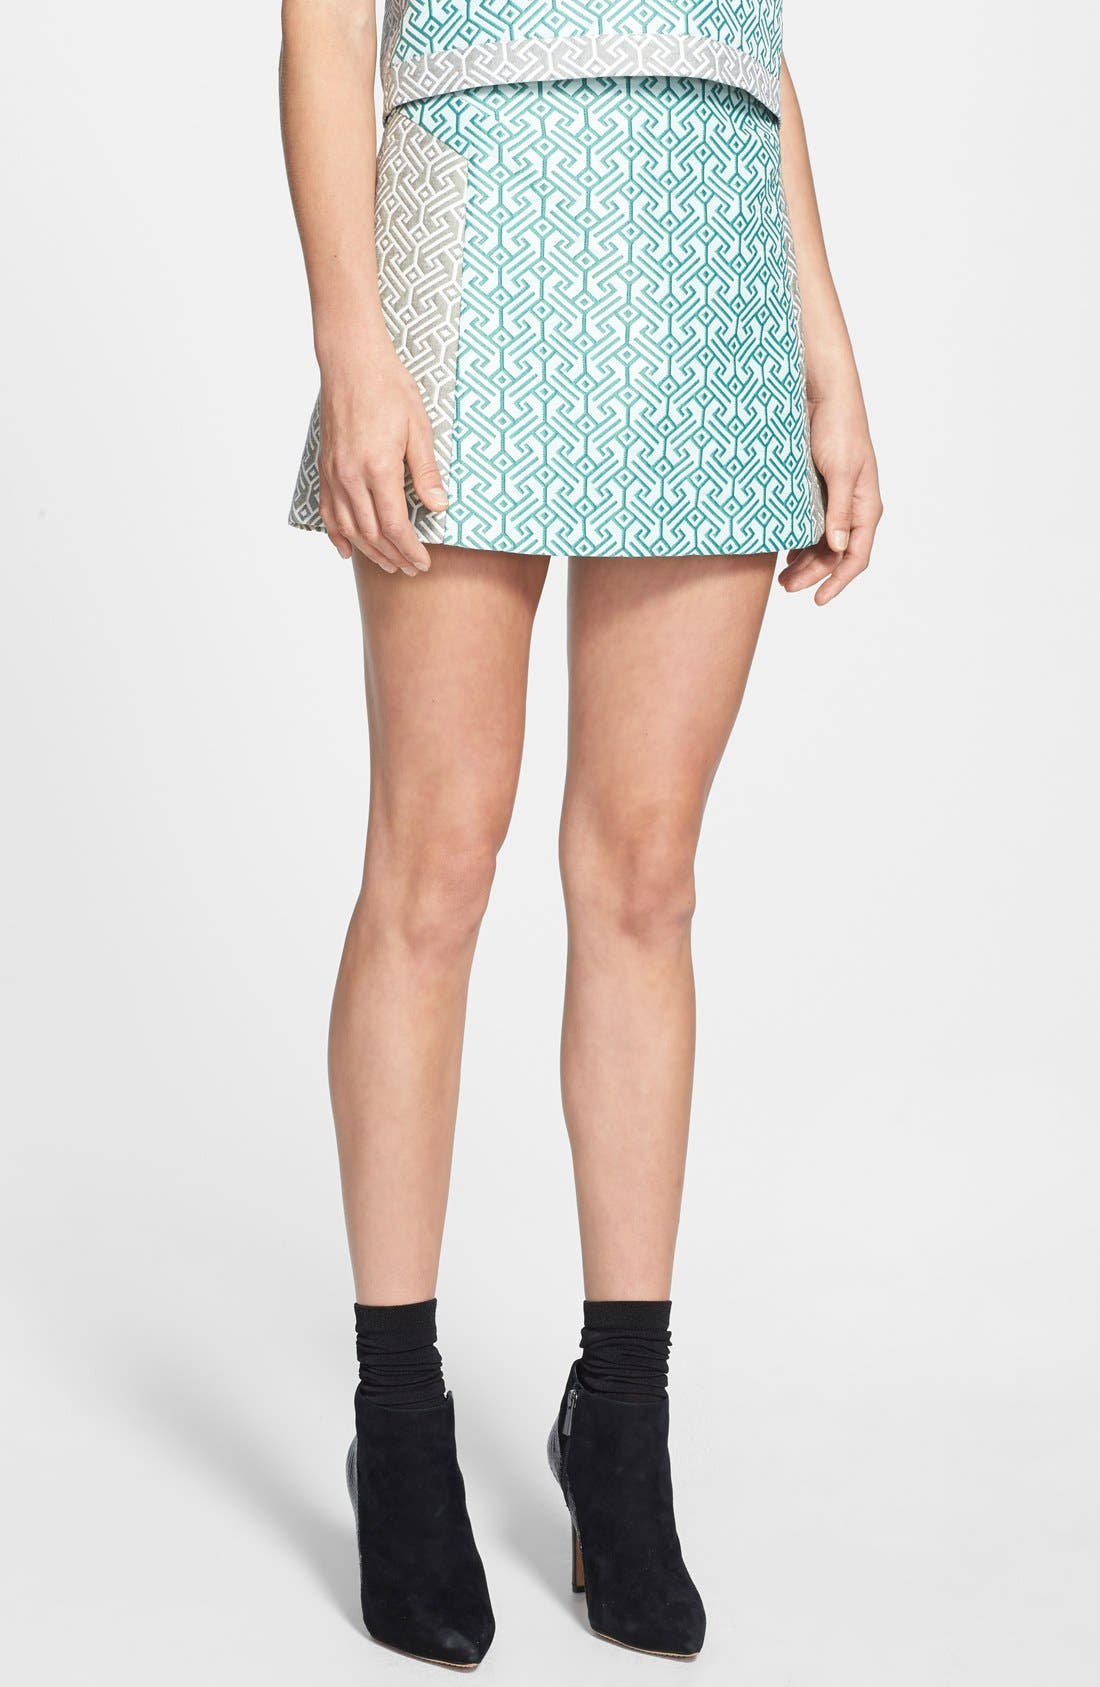 Alternate Image 1 Selected - Topshop Colorblock Jacquard Skirt (Nordstrom Exclusive)